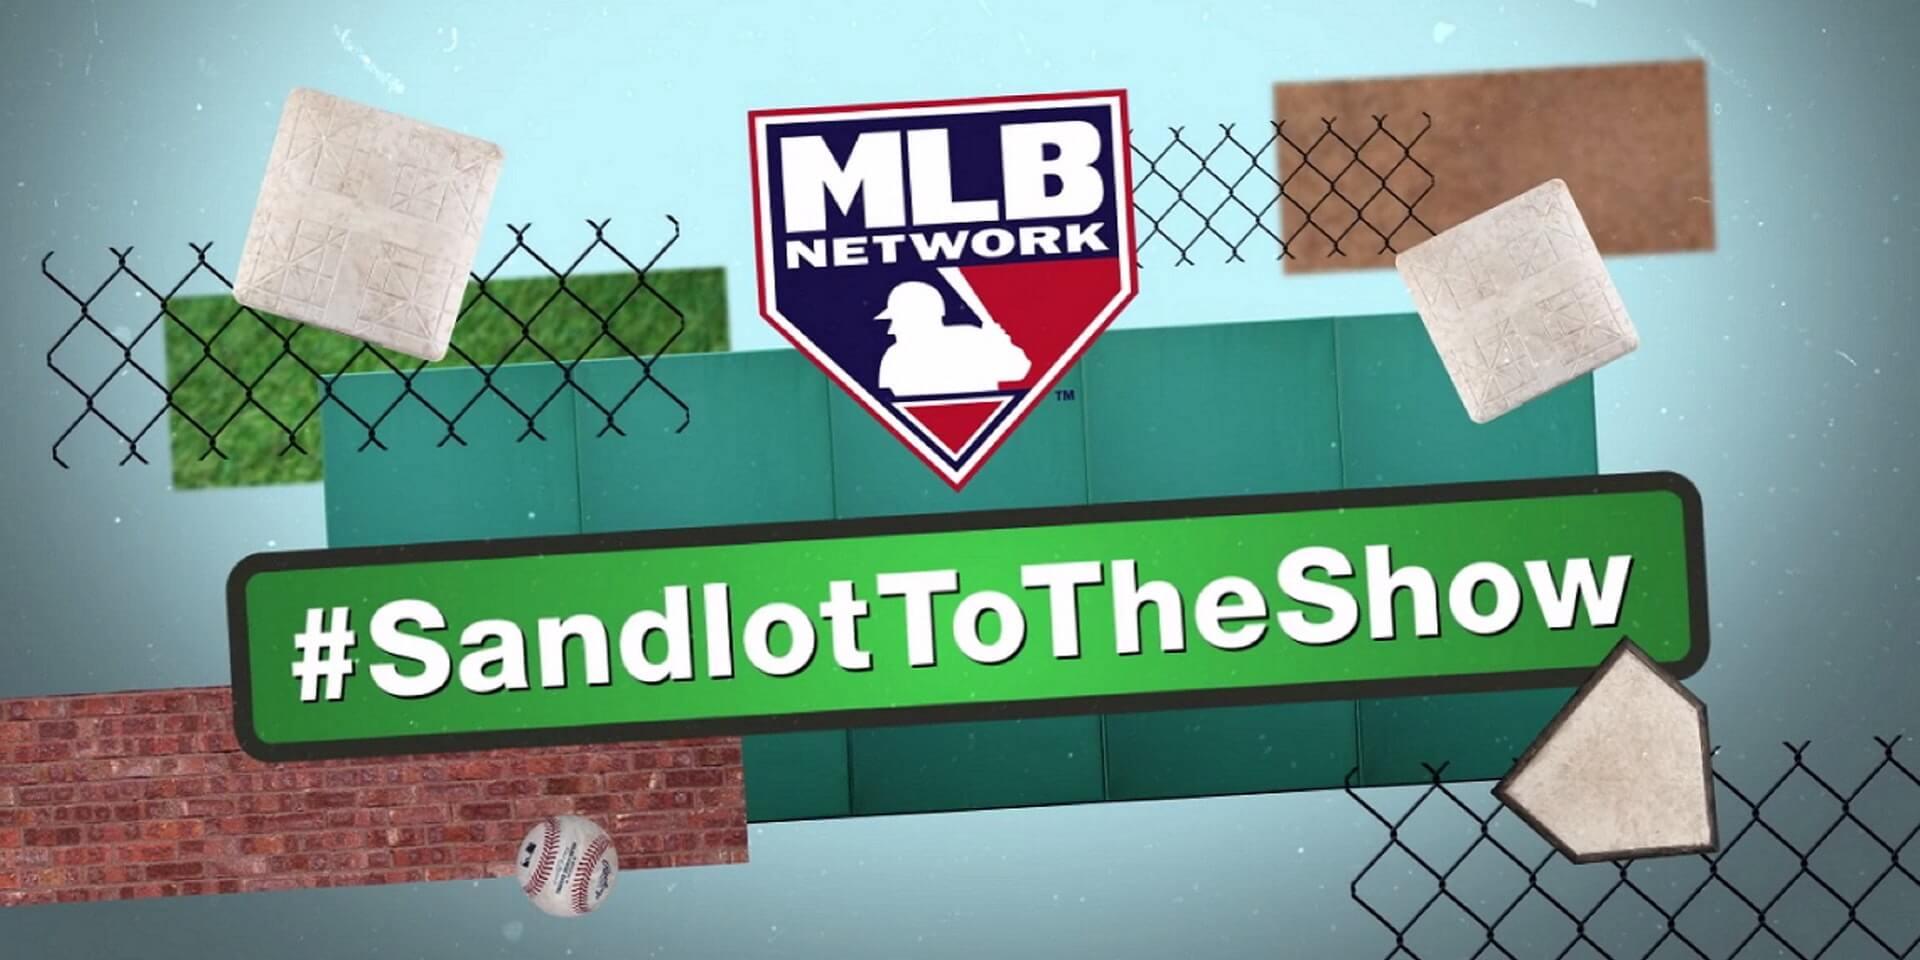 MLB Networks #SandlotToTheShow